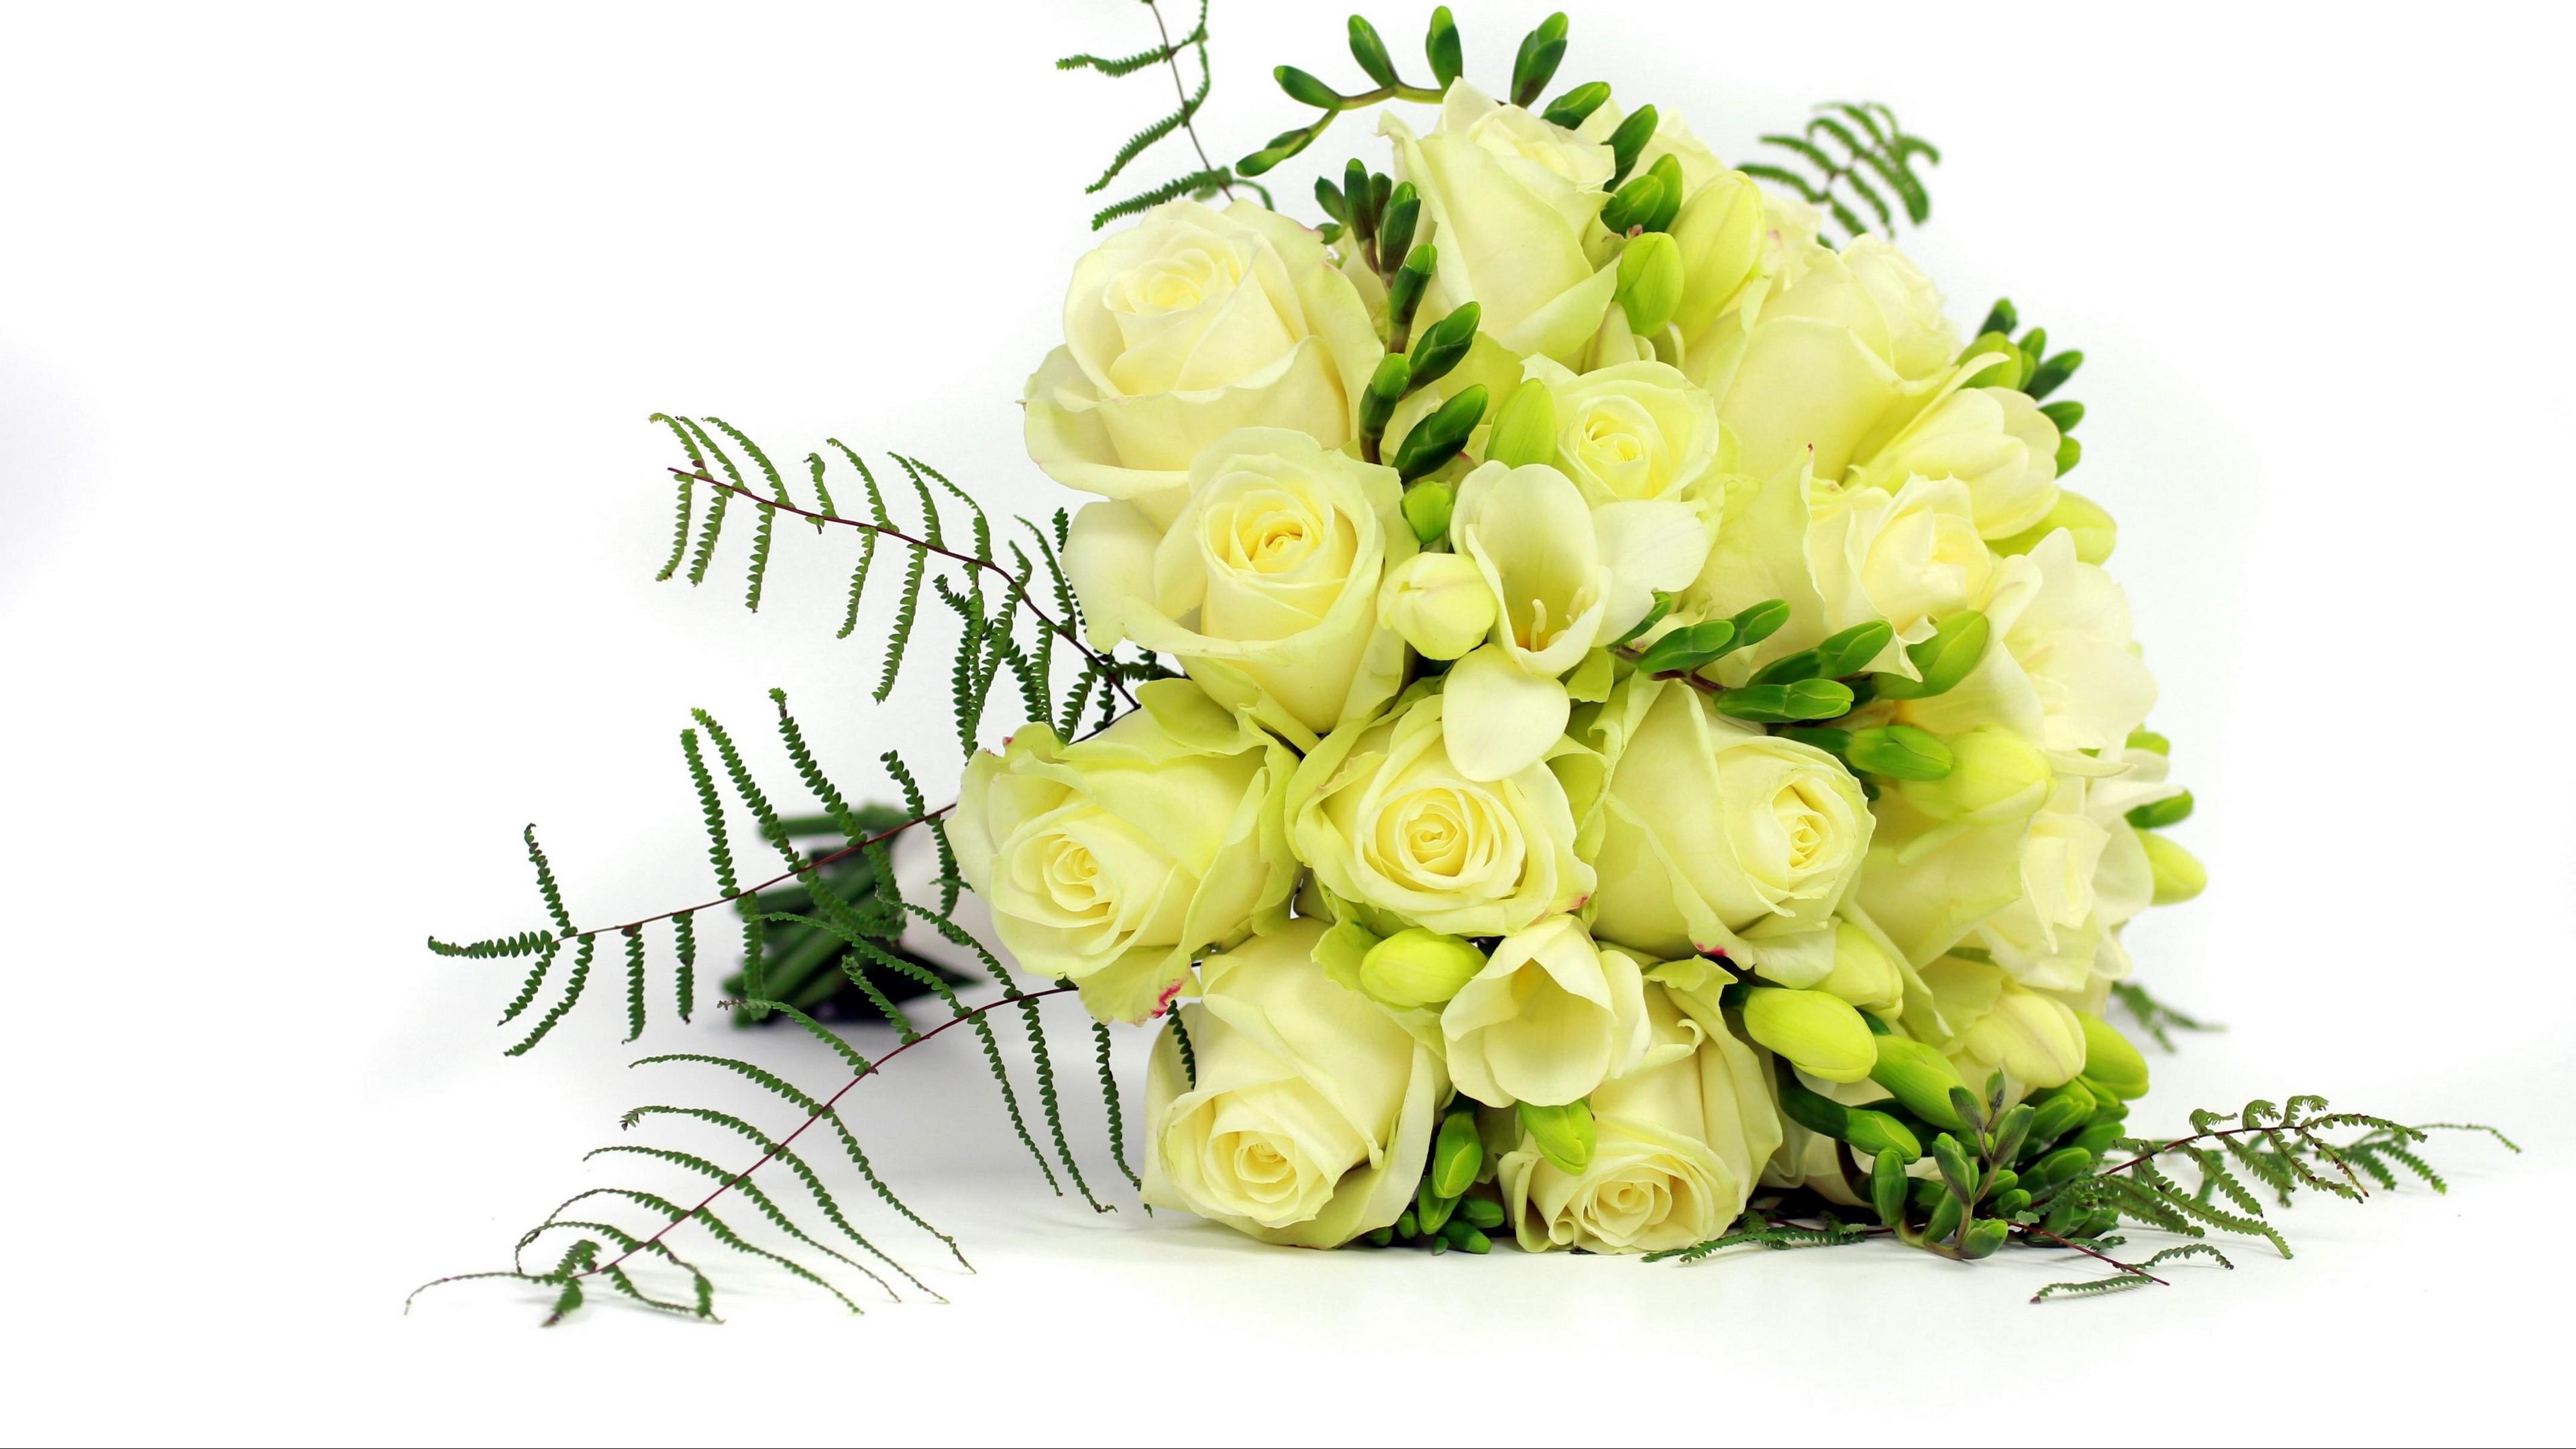 roses freesia bouquet decoration 4k 1540064291 - roses, freesia, bouquet, decoration 4k - Roses, freesia, Bouquet